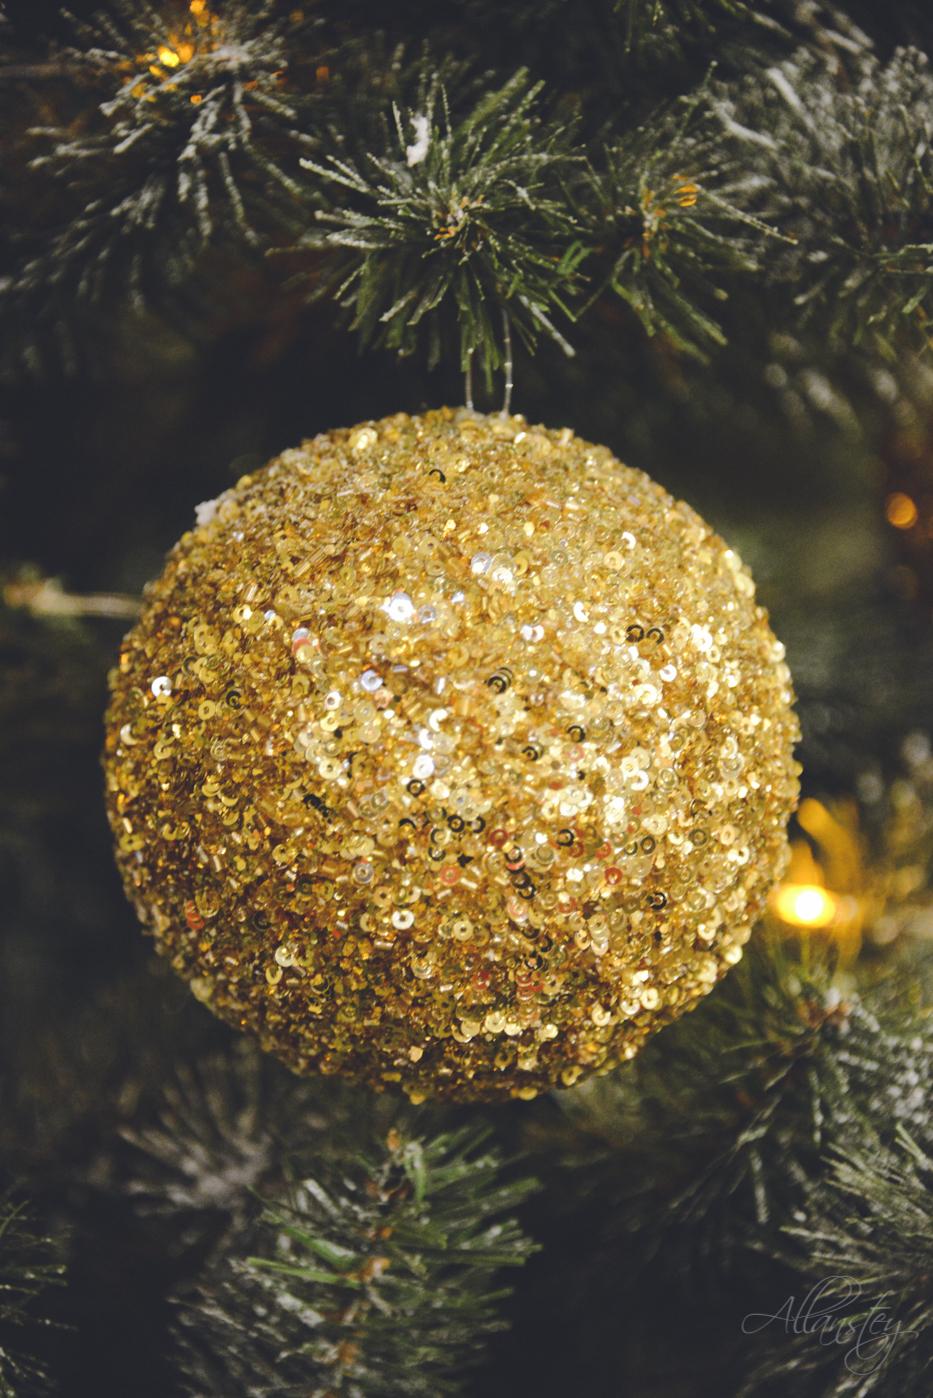 Golden glitter Christmas ball decoration closeup on Christmas tree